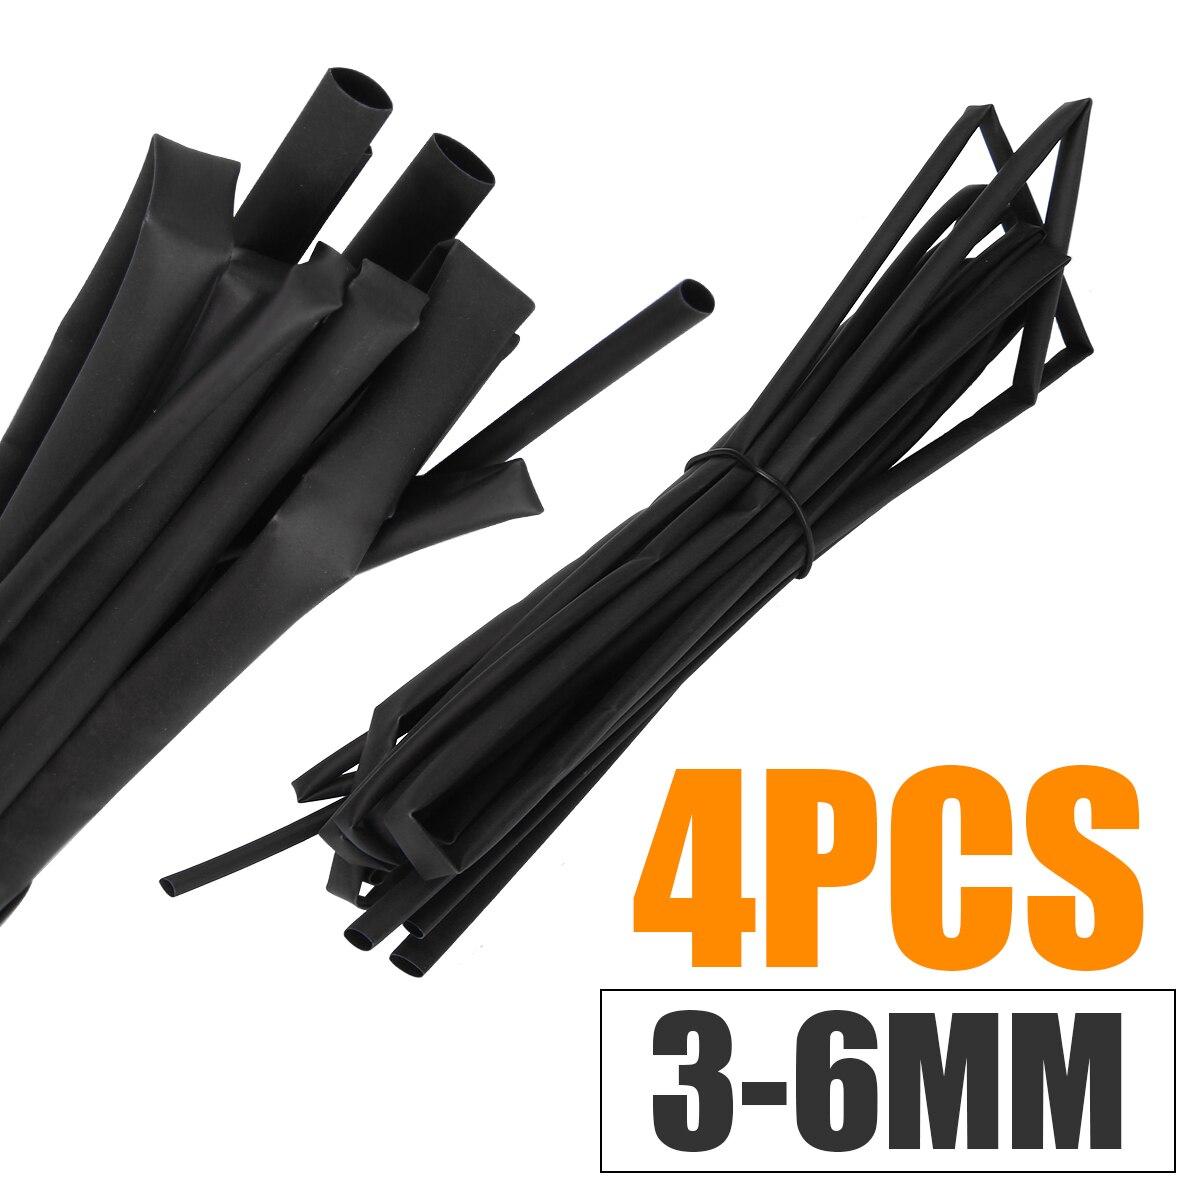 4pcs Heat Shrink Tube Sleeving Black Wrap 3mm 4mm 5mm 6mm Accessory Electrical